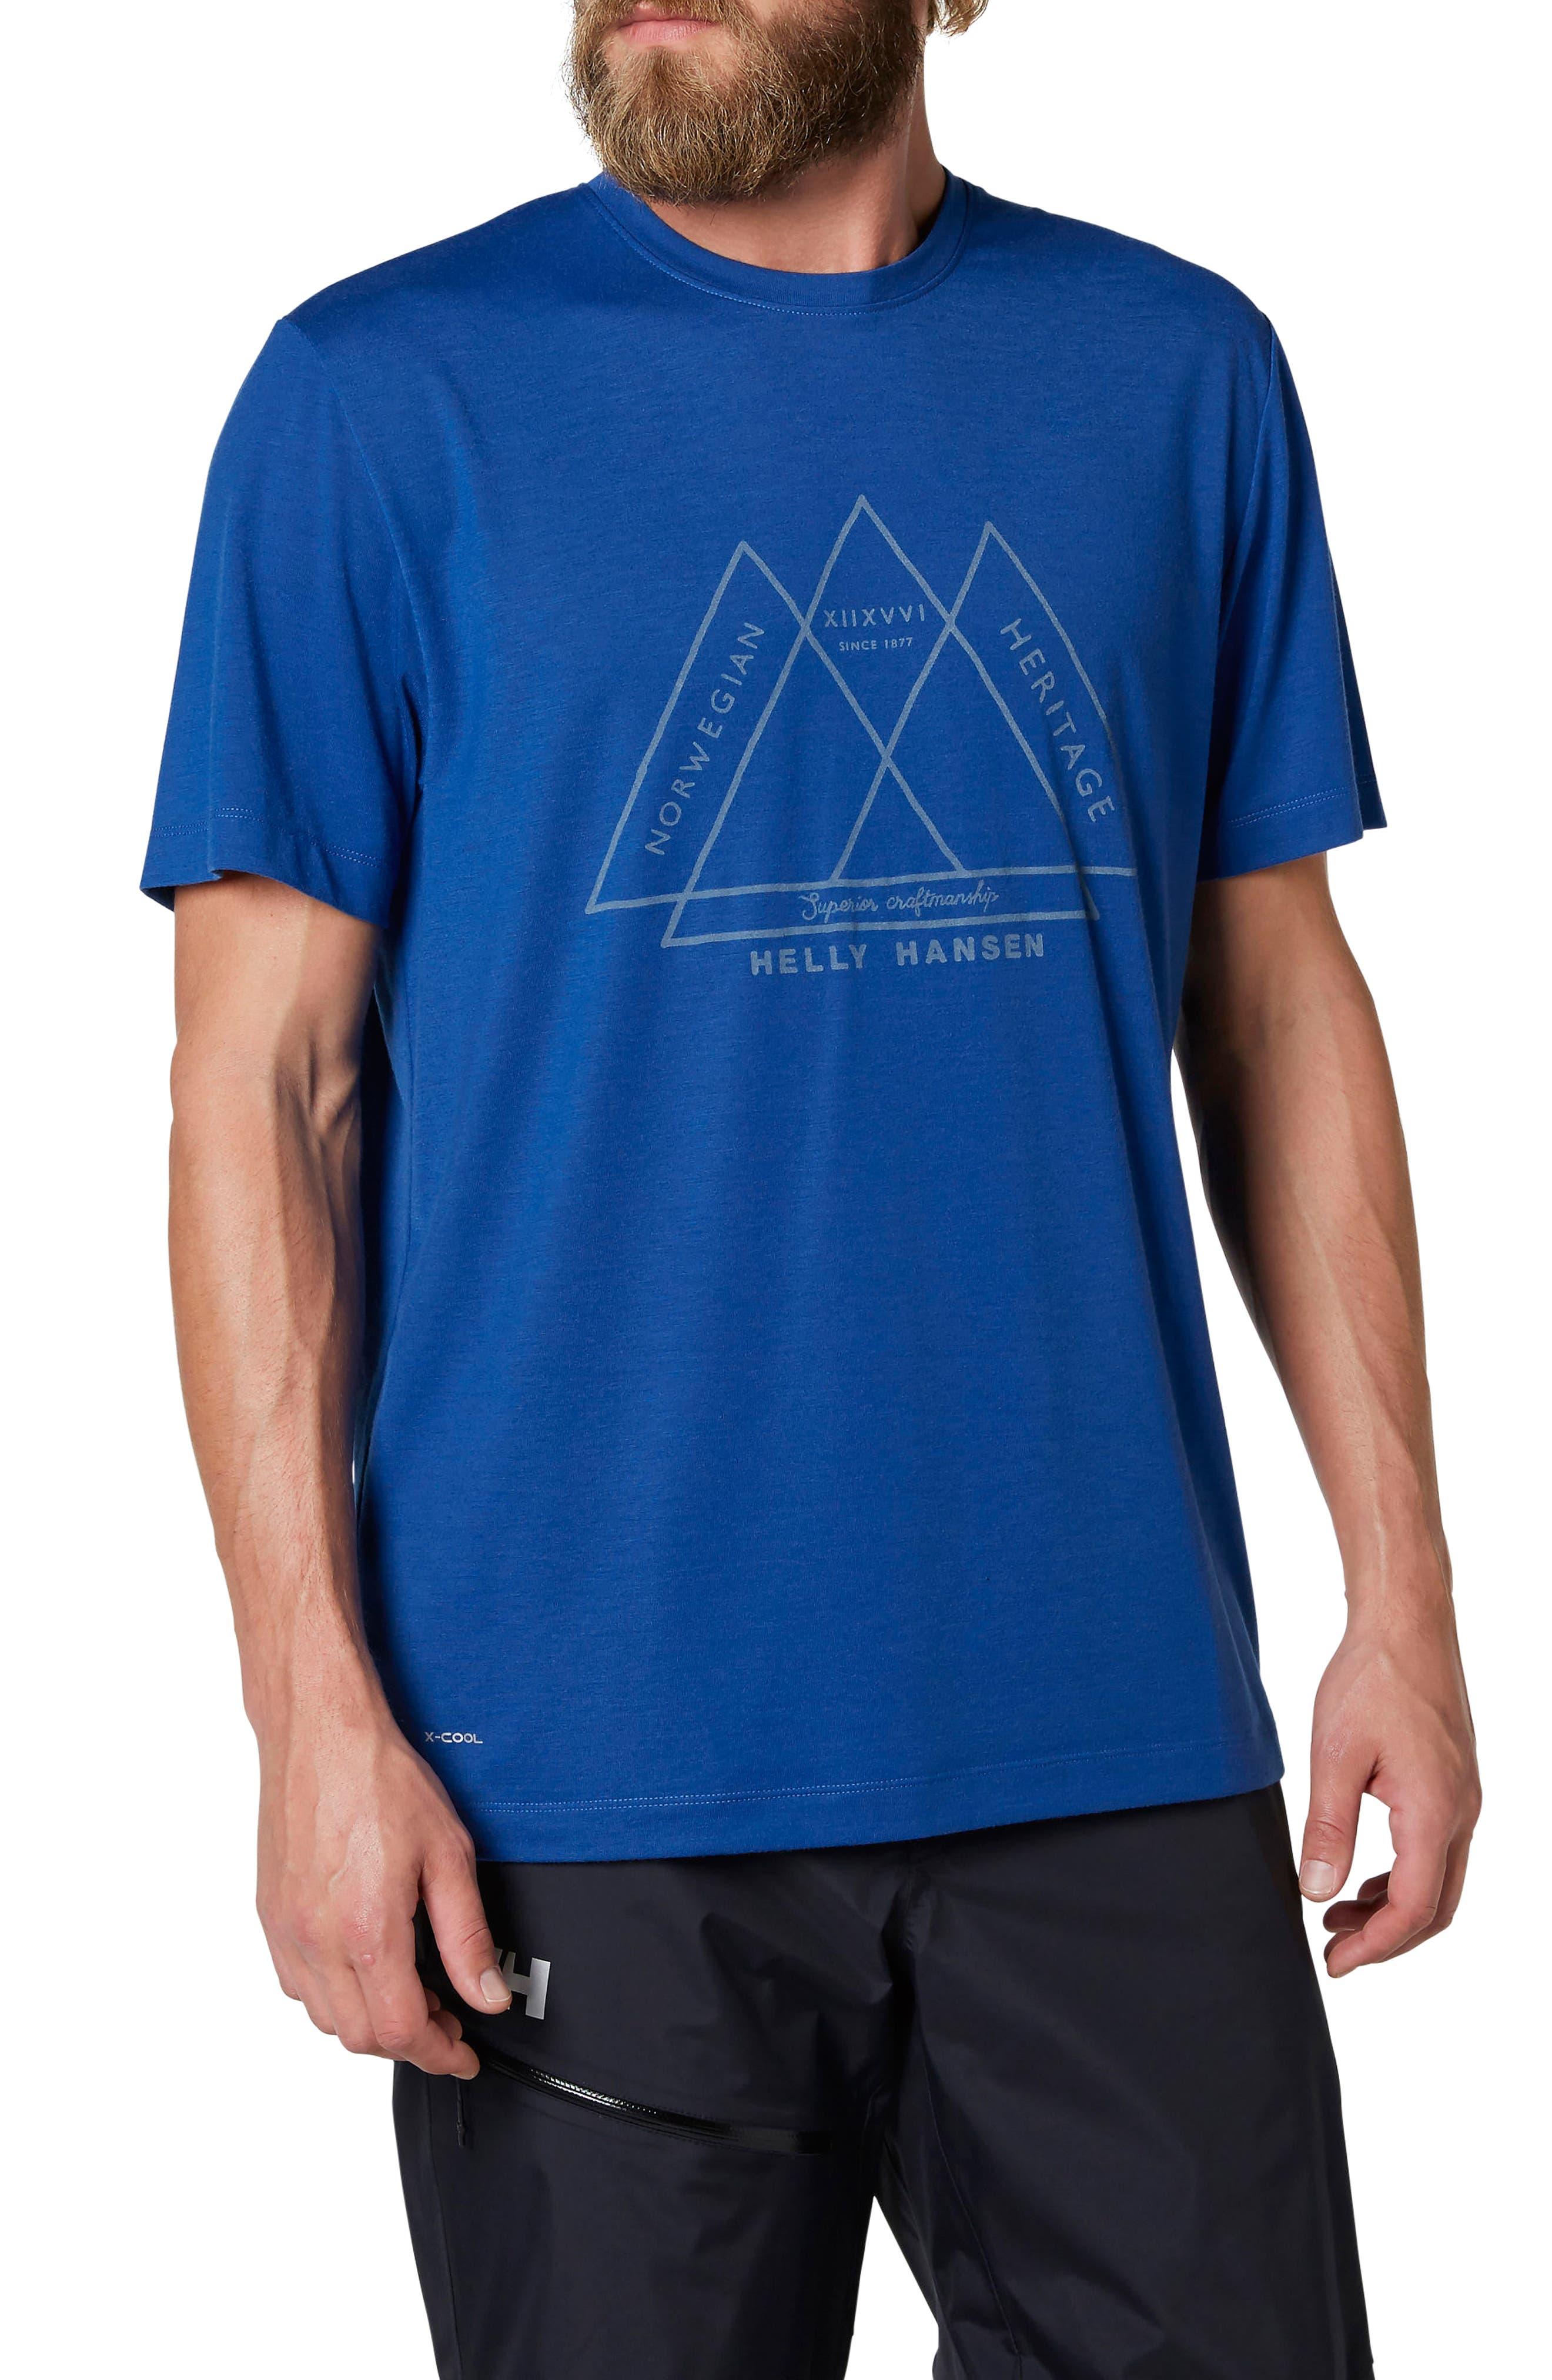 Helly Hansen Rune Graphic T-Shirt